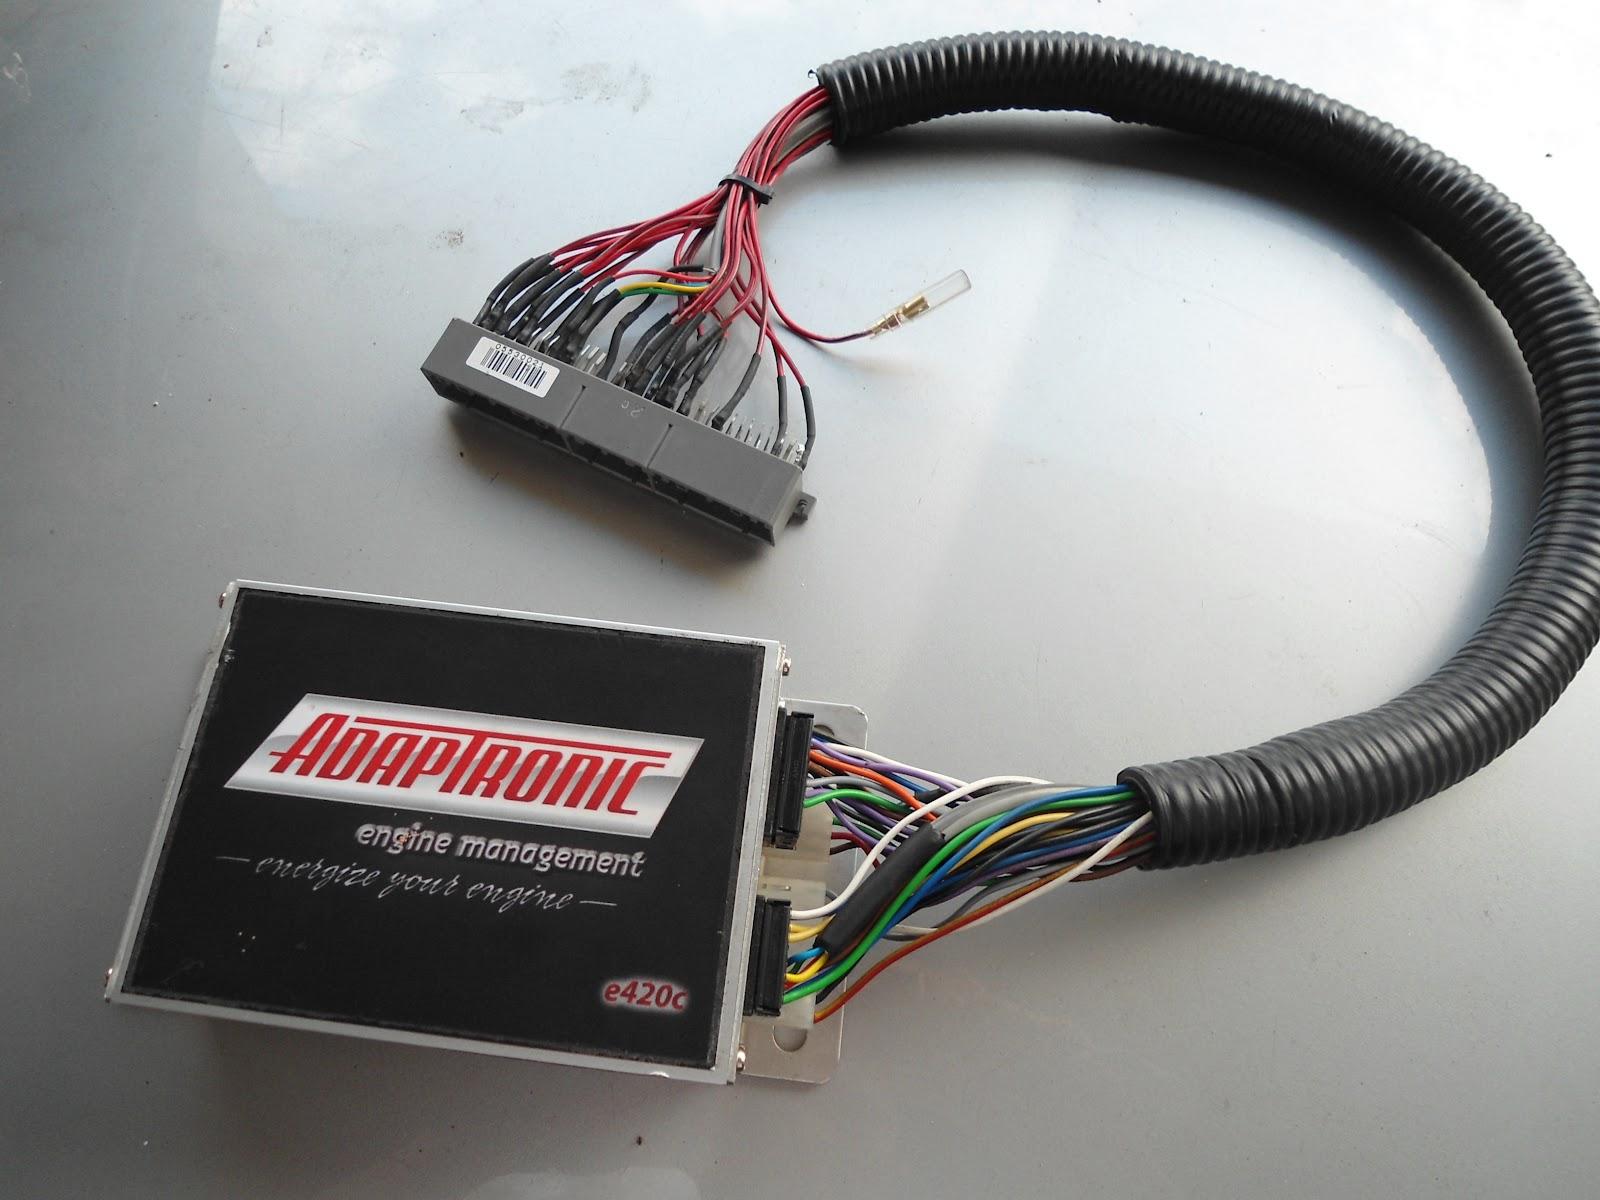 4age 20v distributor wiring diagram 1999 ford explorer cooling system r n autosport vehicle and engine management